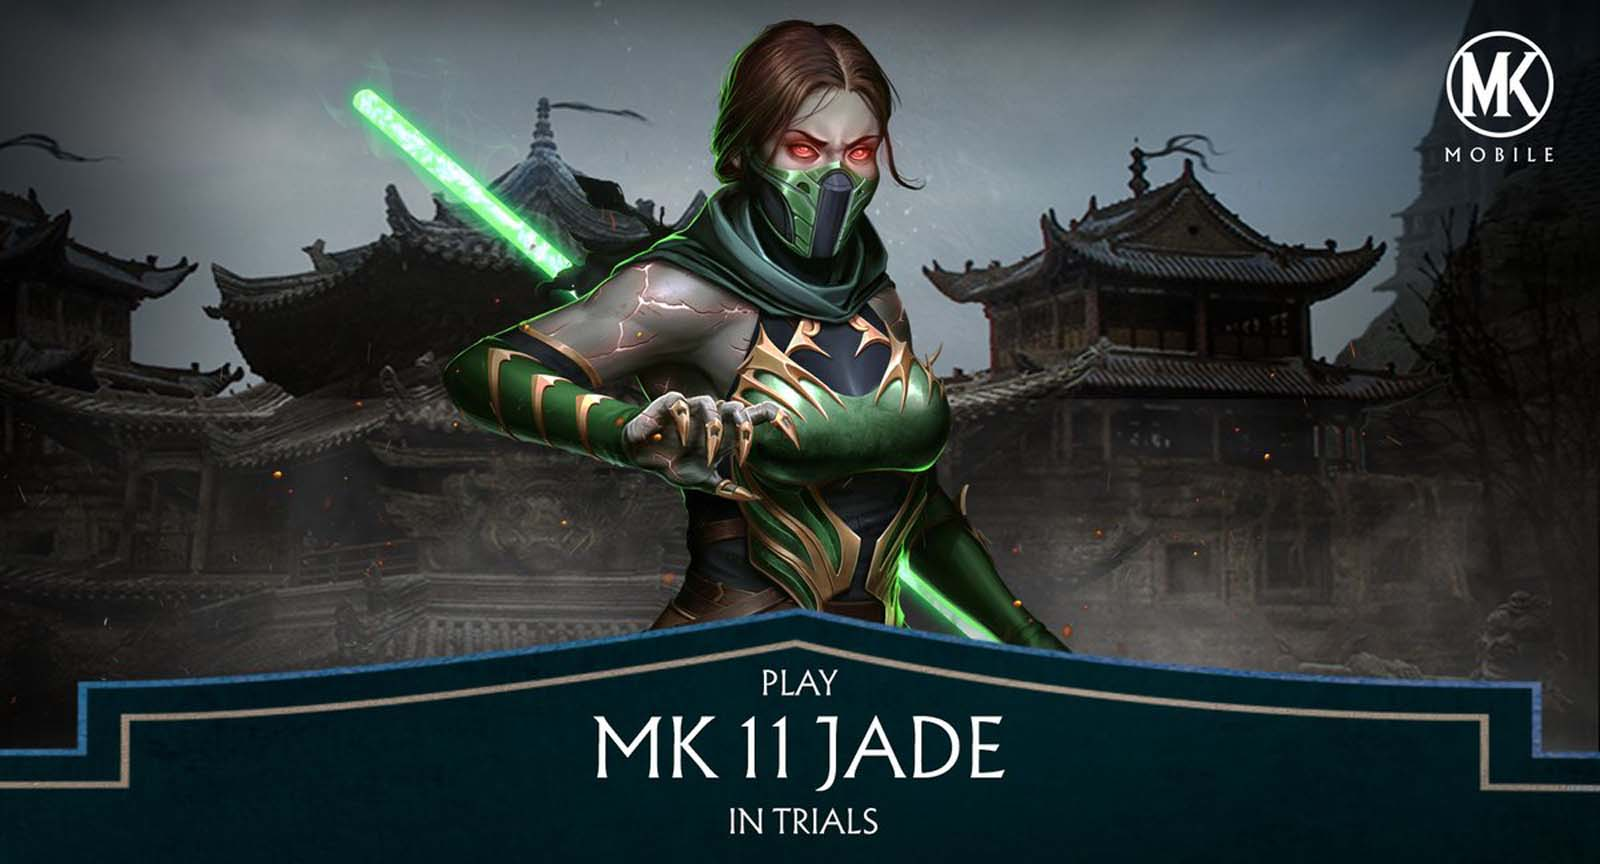 Mortal Kombat Mobile releases MK11 characters in 2 0 update